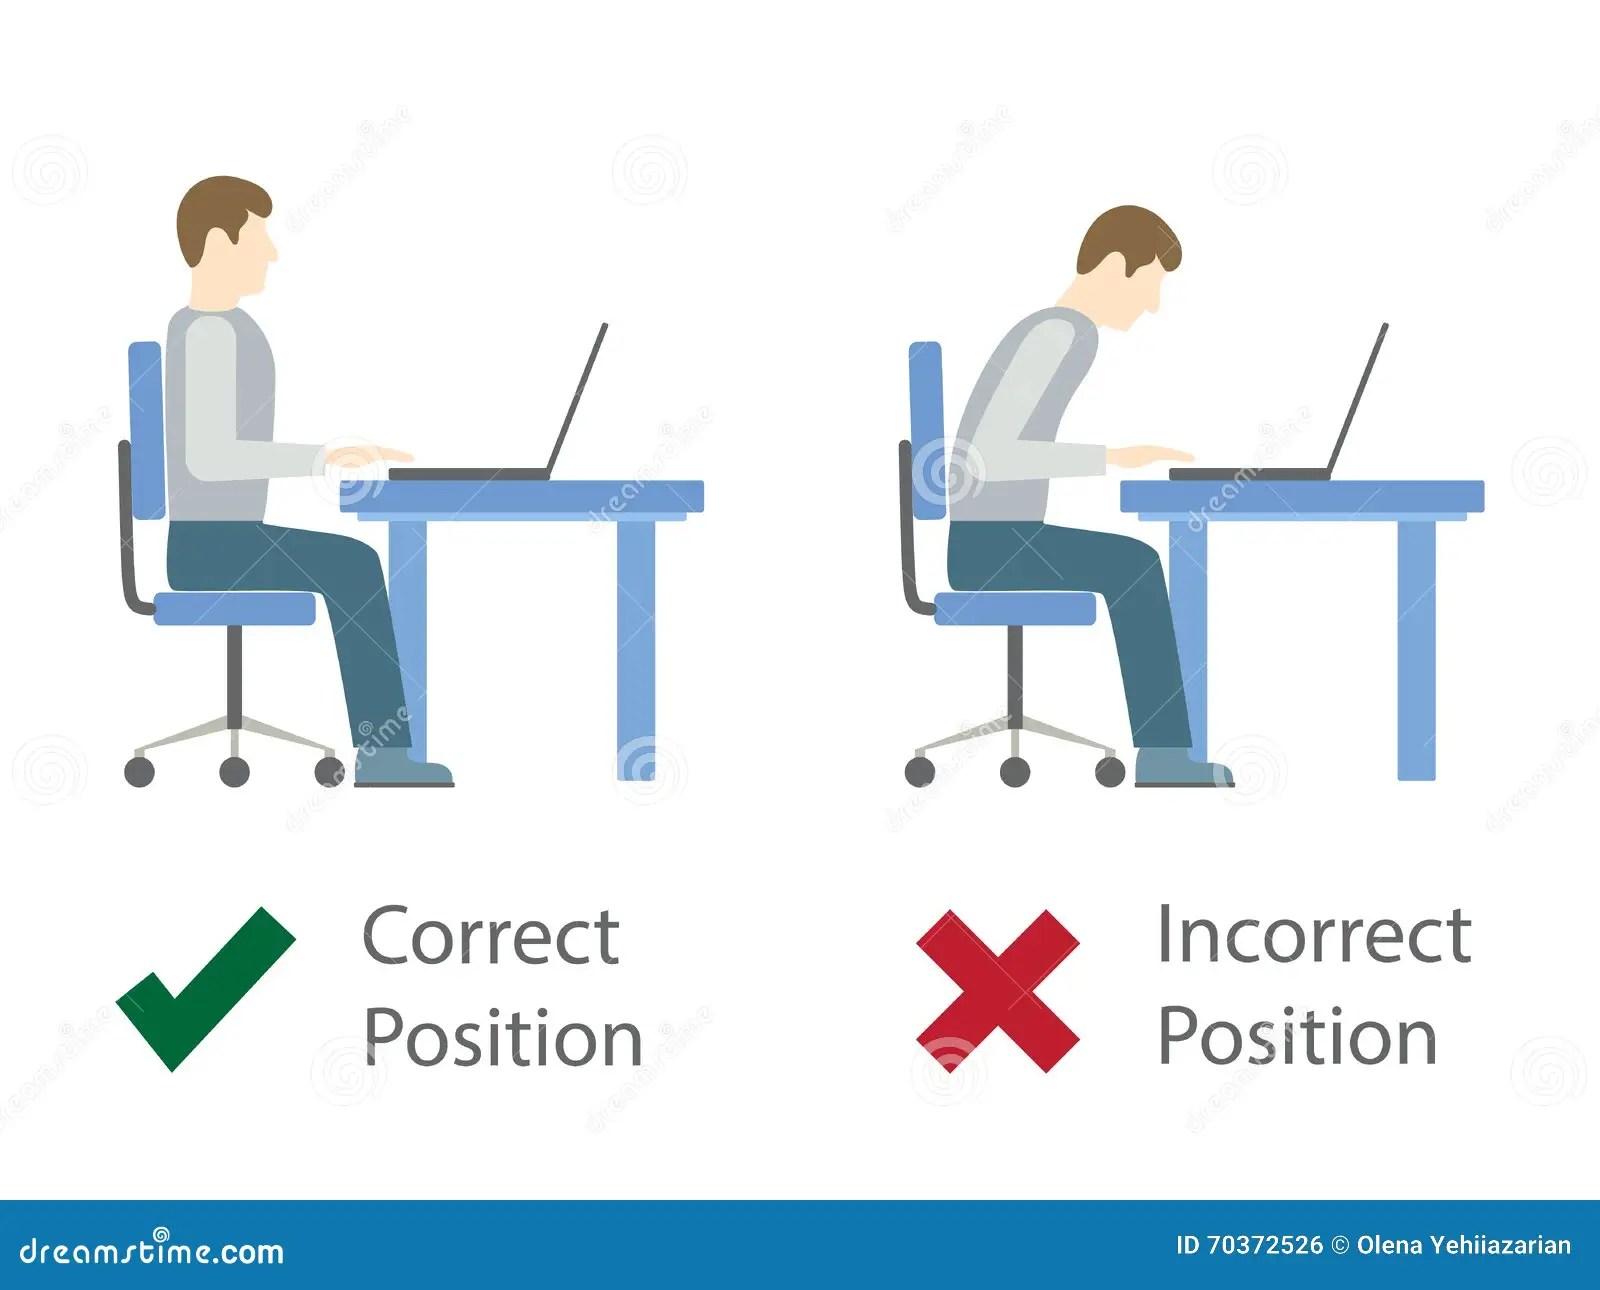 proper posture desk chair fishing and umbrella correct incorrect sitting at computer stock